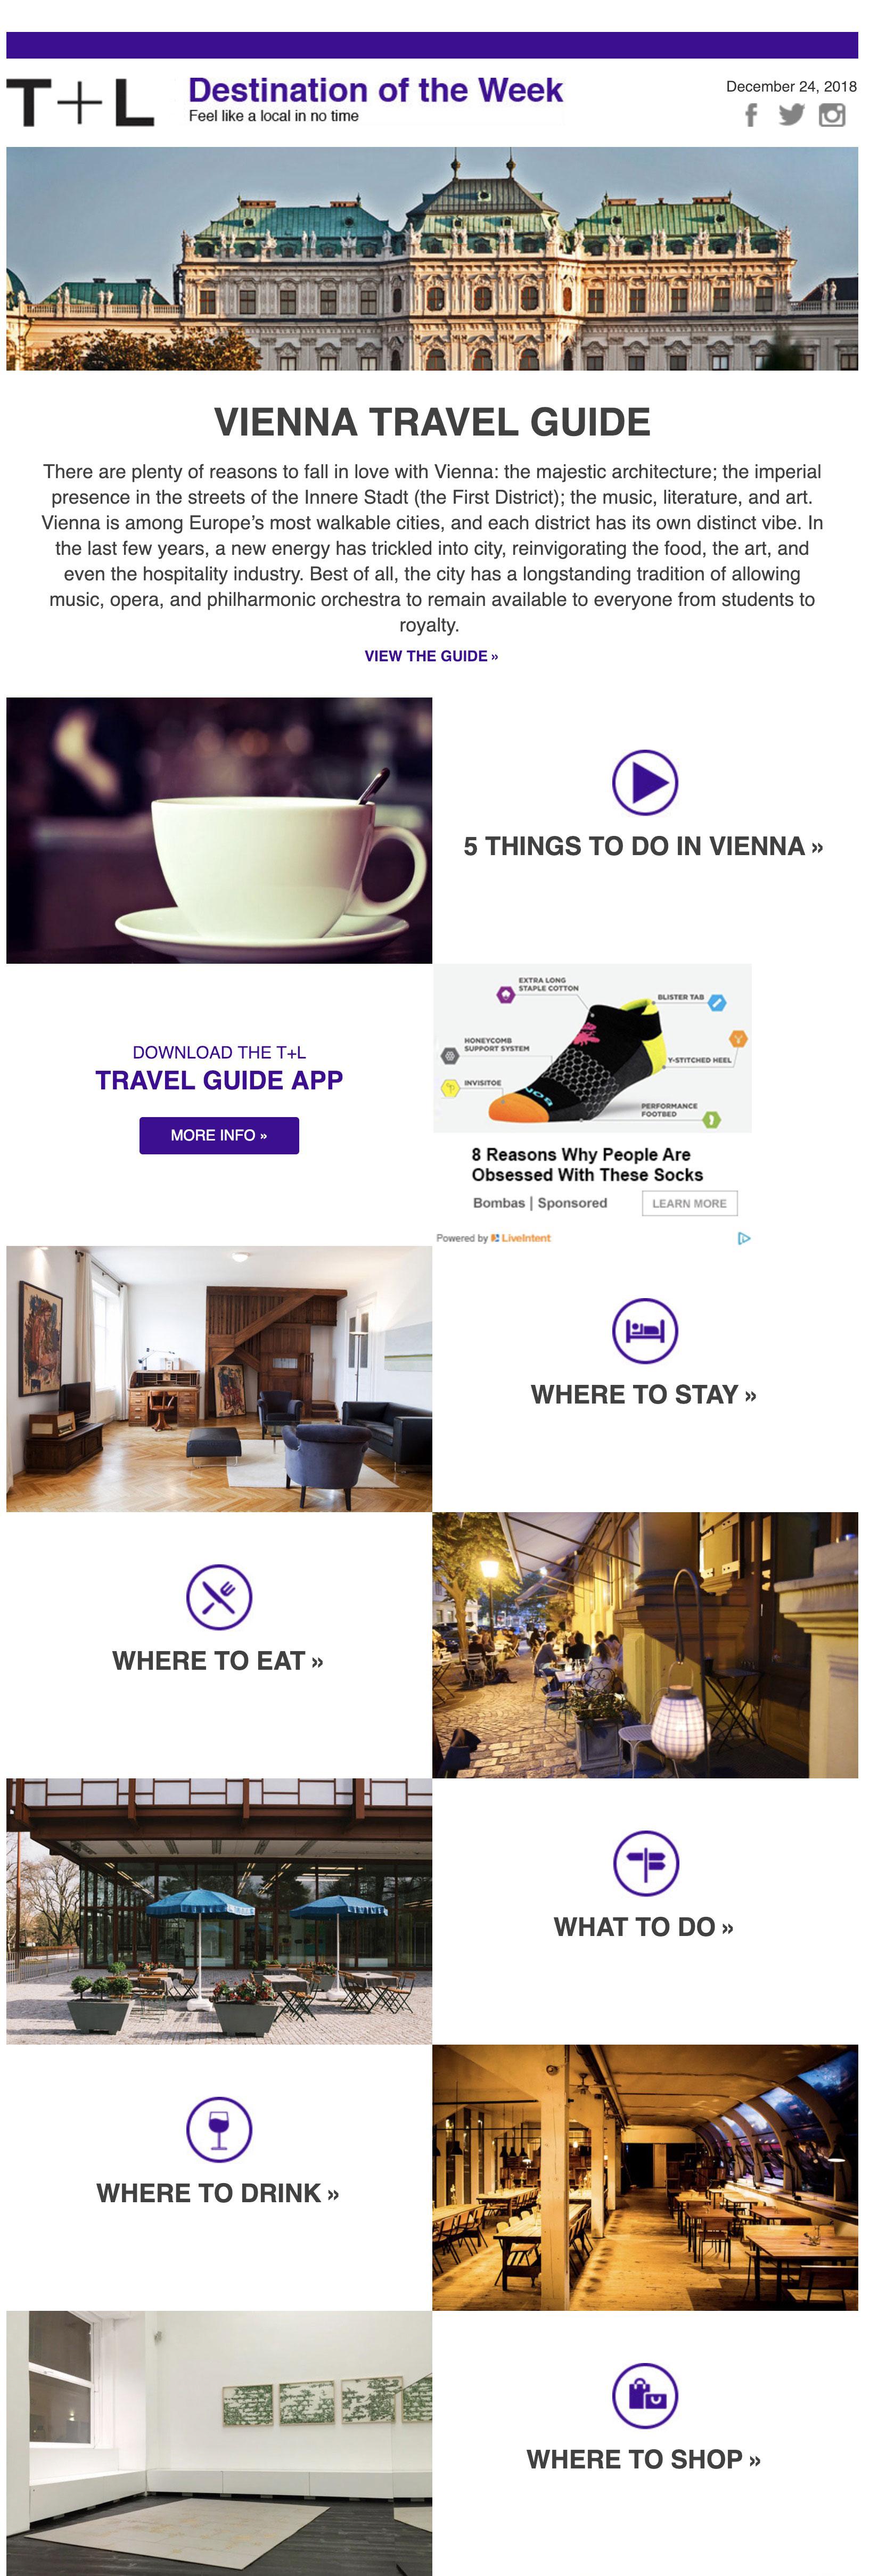 T & Lcampaña email sector turismo y viajes